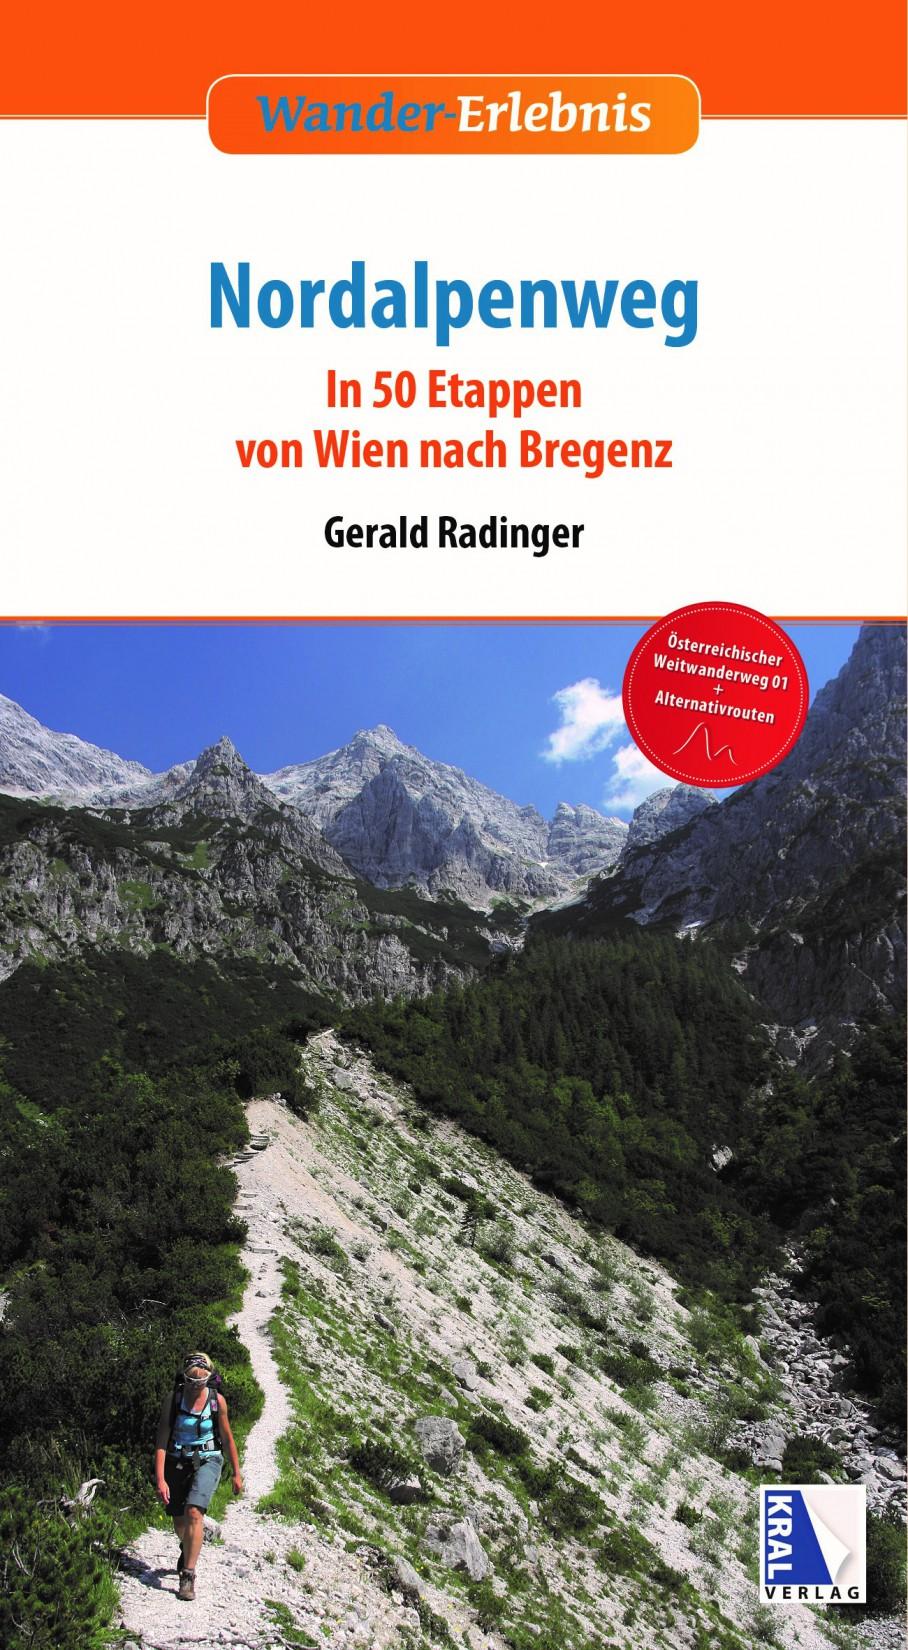 Wander-Erlebnis Nordalpenweg